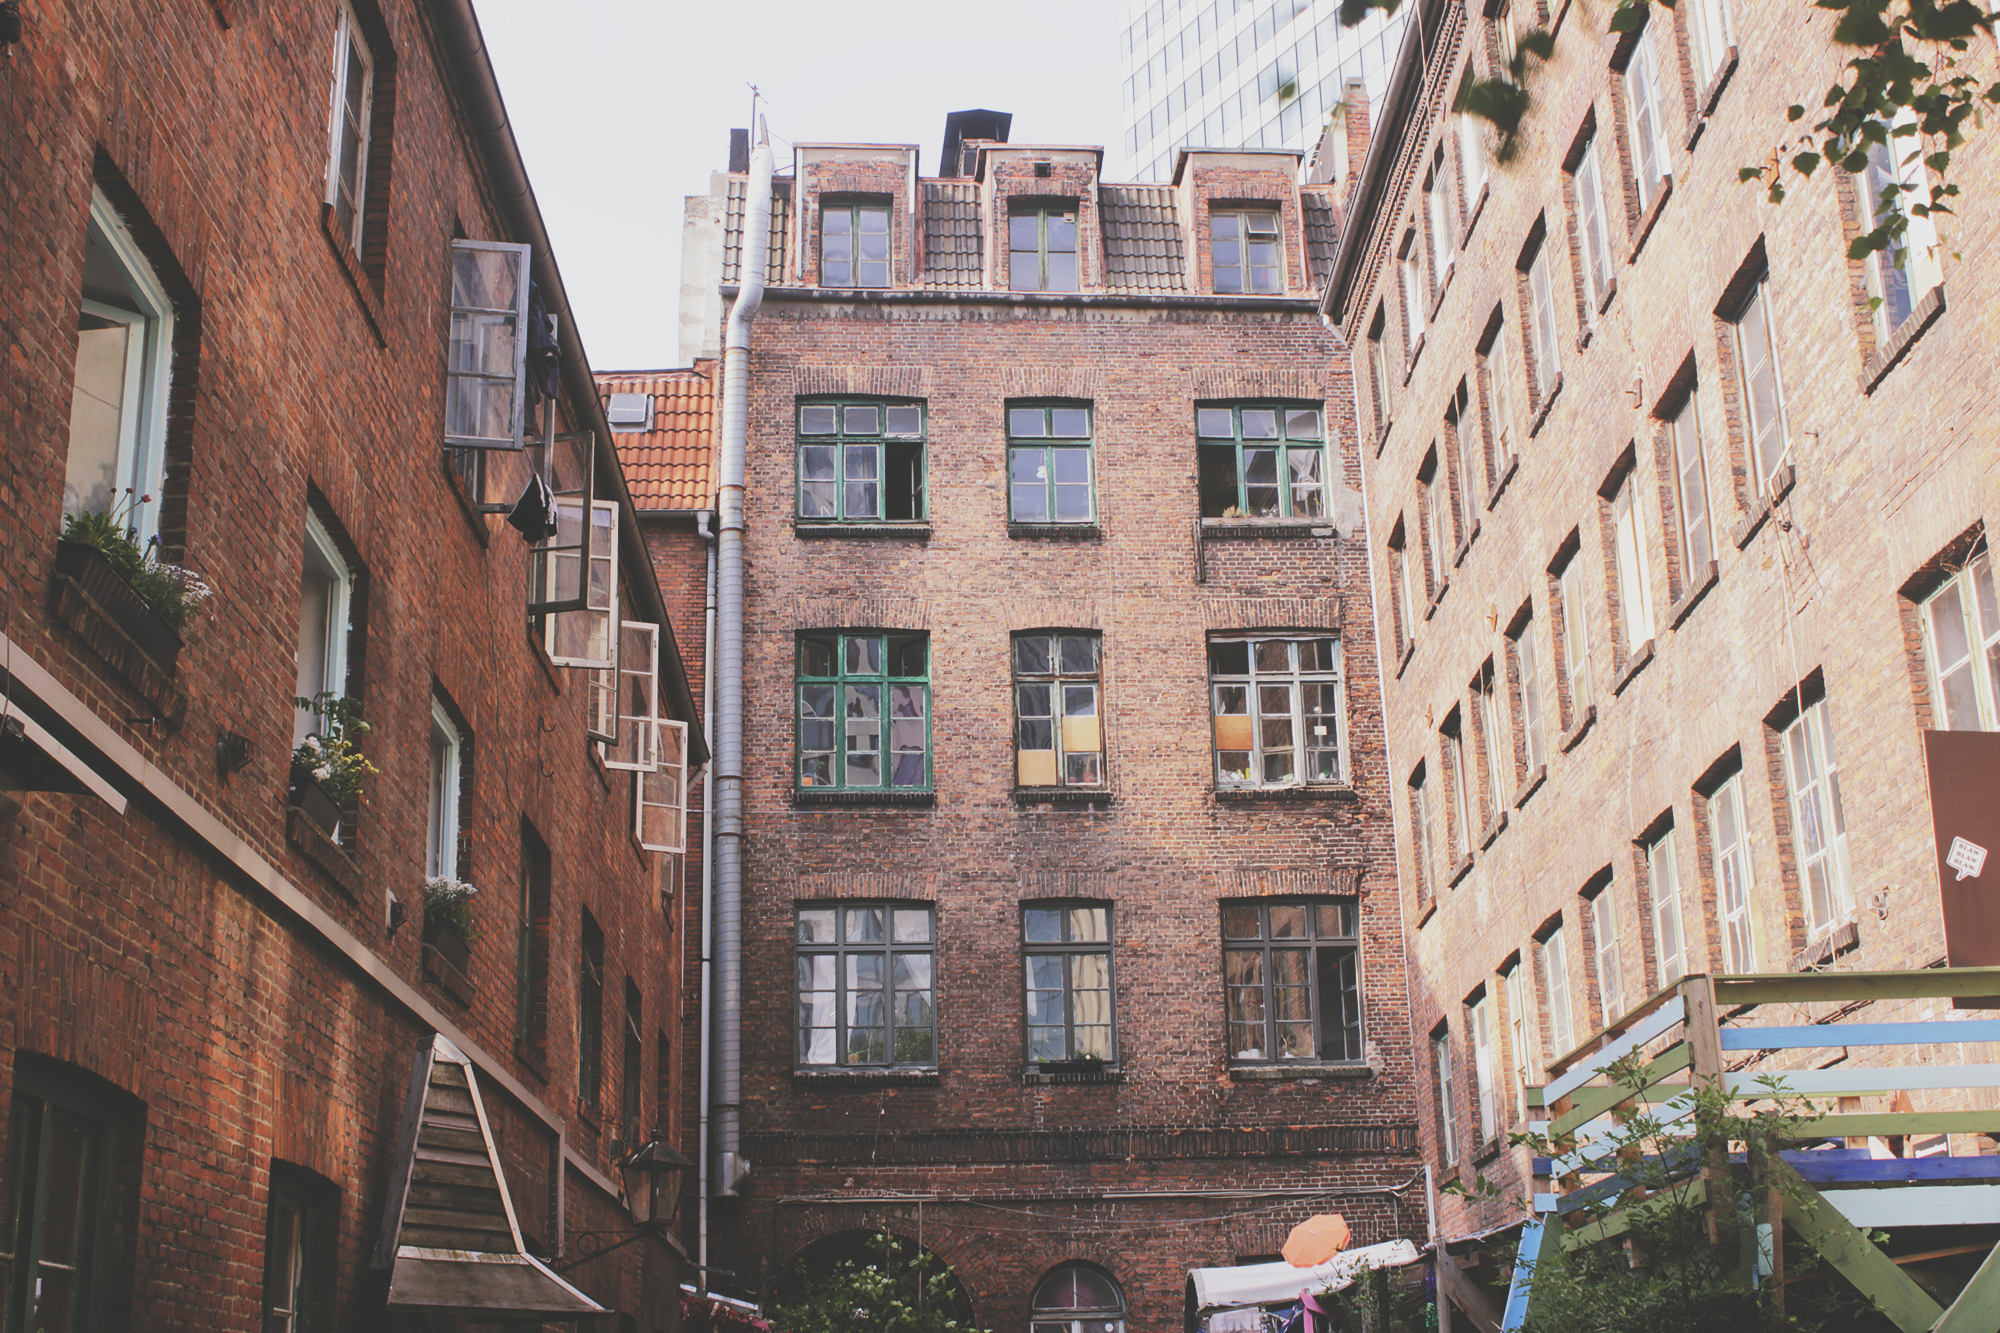 Elsewhere - Inspiring Travel Blogs - endearmentendure.com